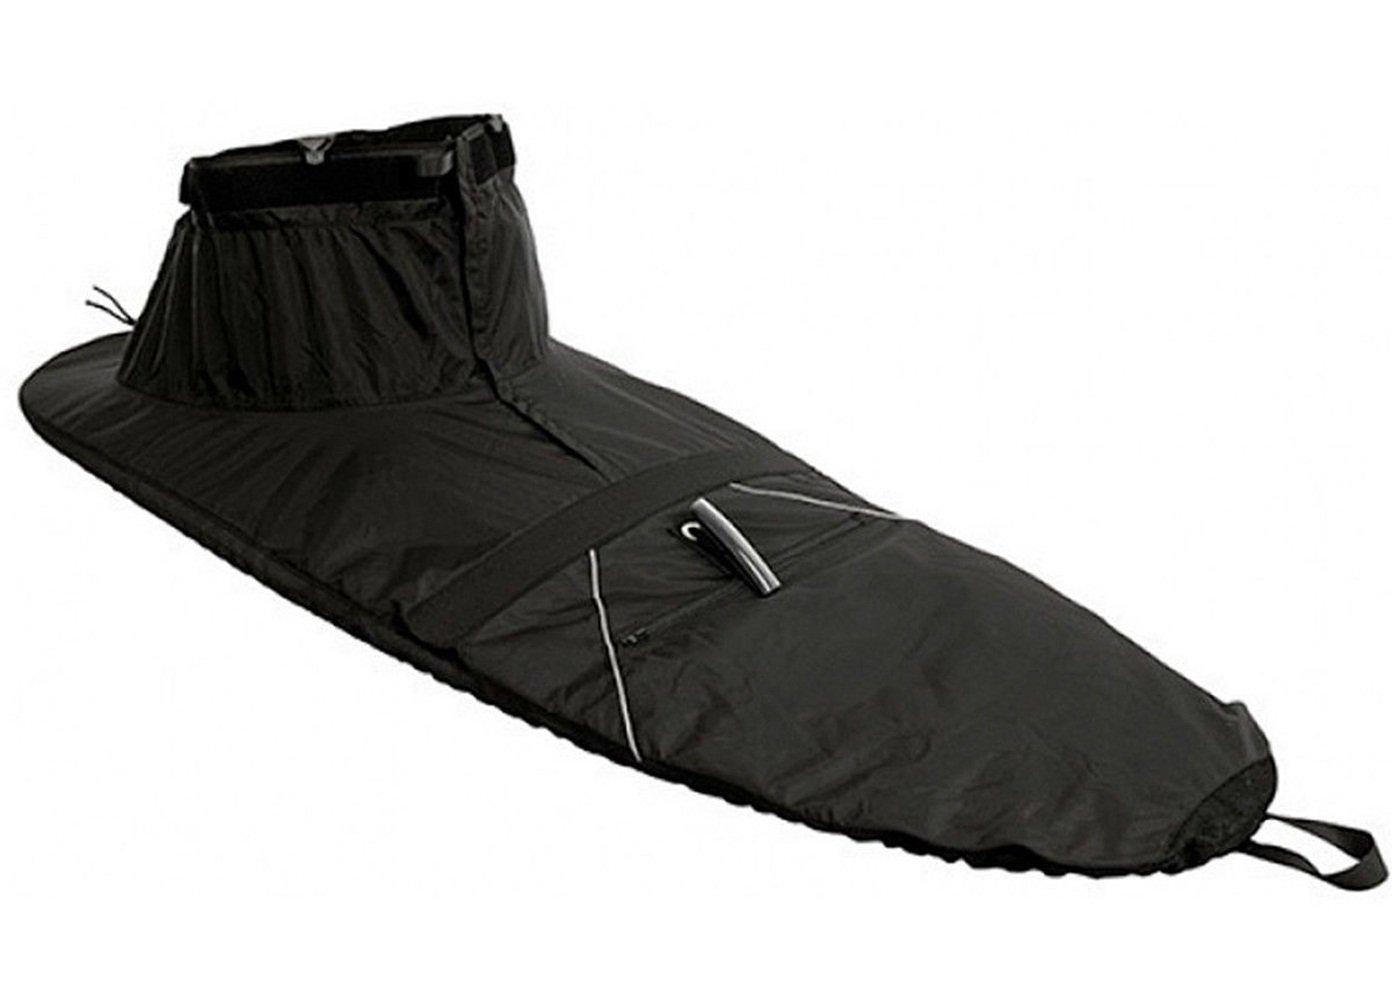 Harmony Synergy Kayak Spray Skirt with Neoprene Waist 38/20 Accessories Skirt